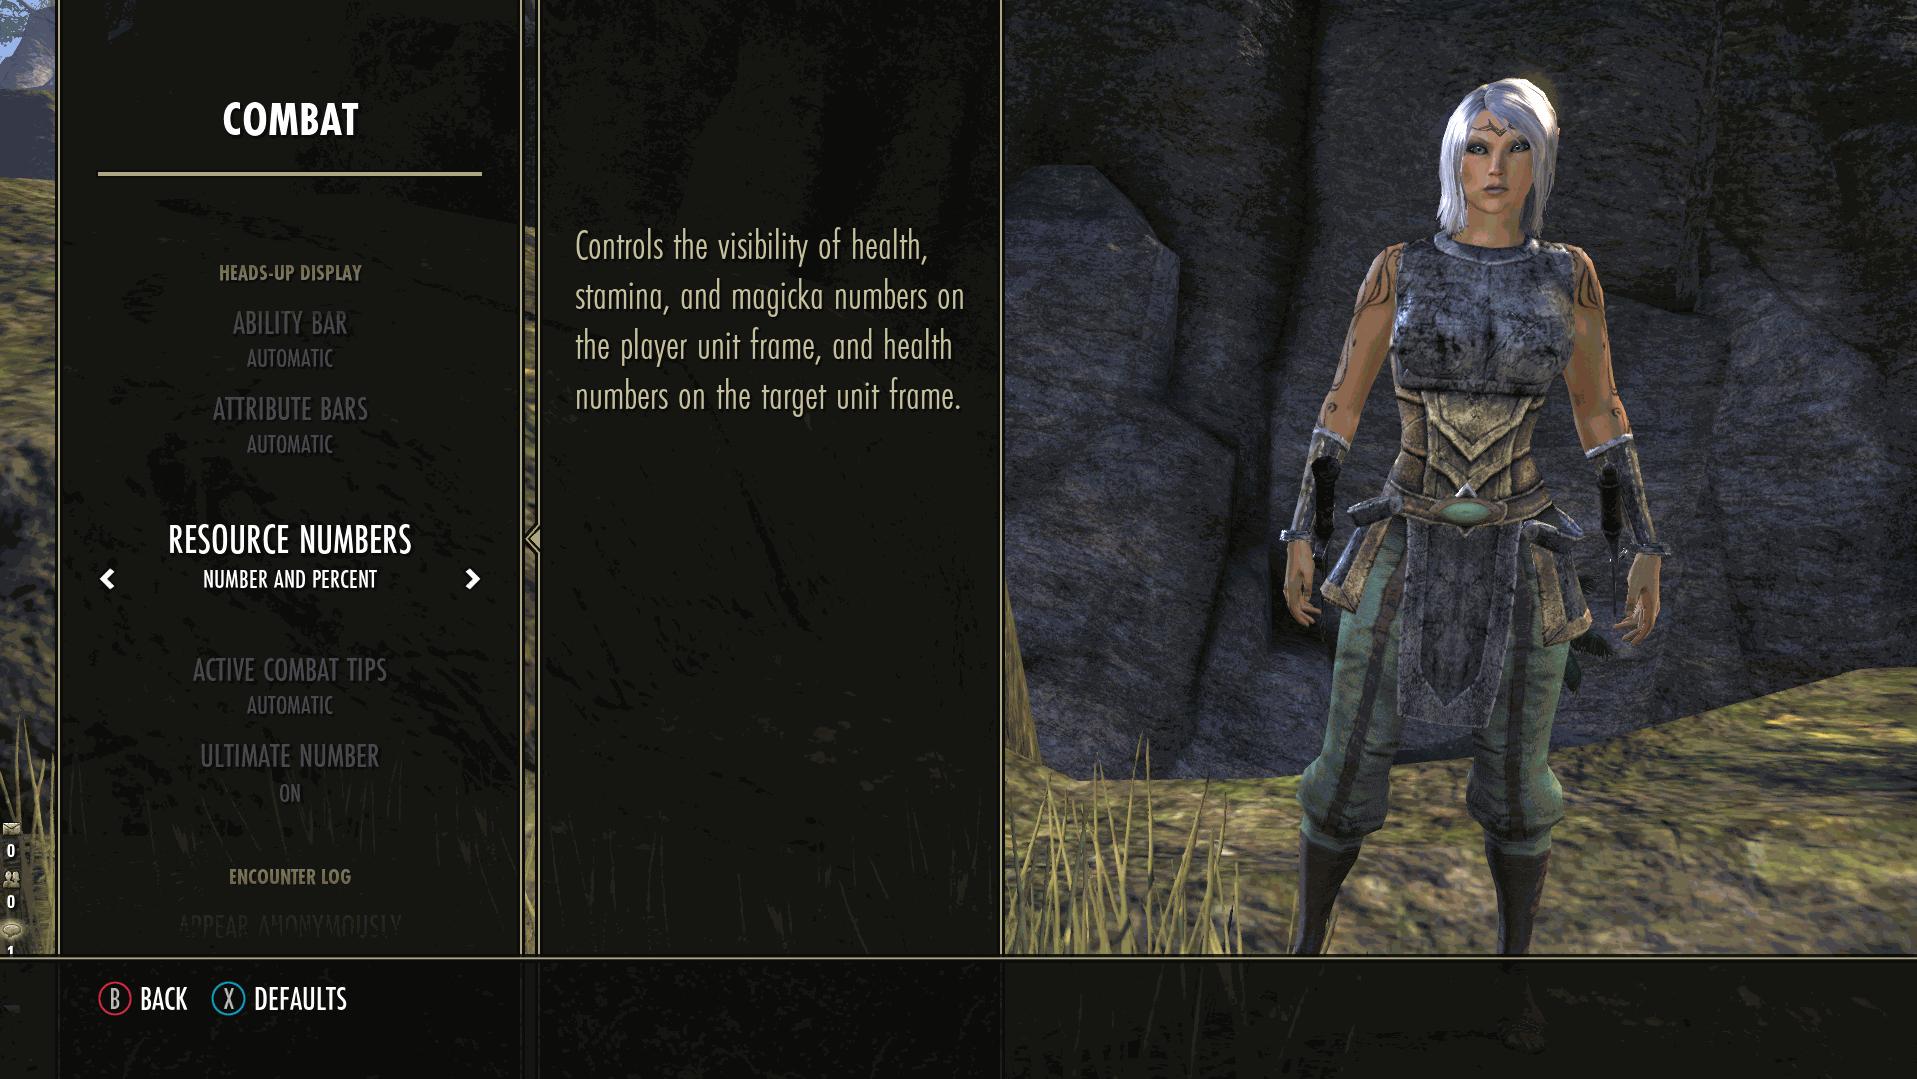 Elder Scrolls Online: Greymoor Combat Settings Menu